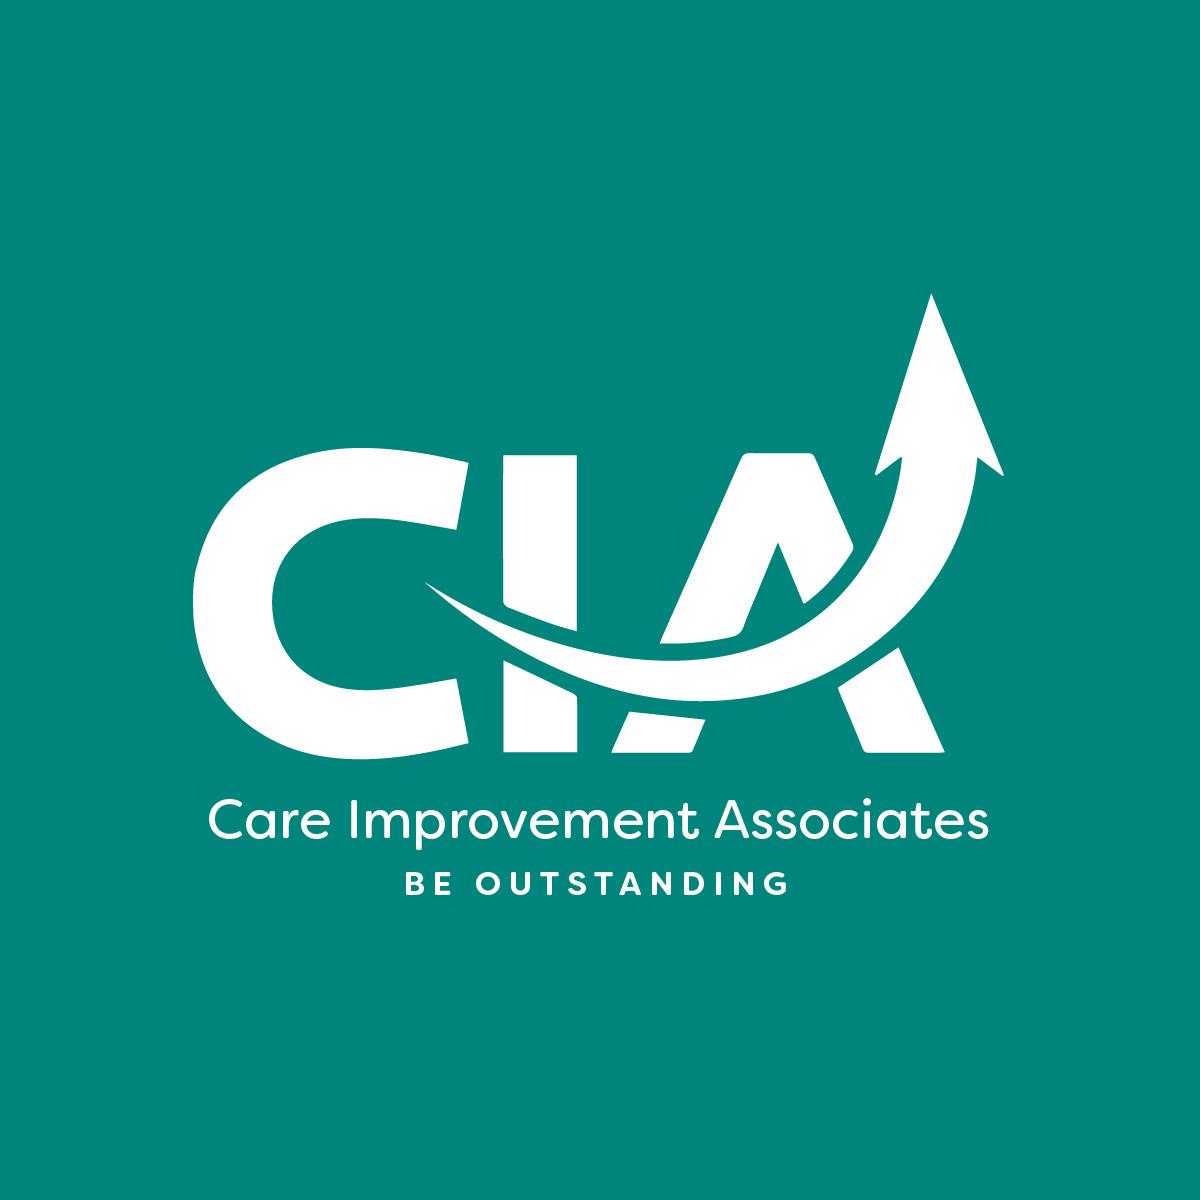 The Care Improvement Associates